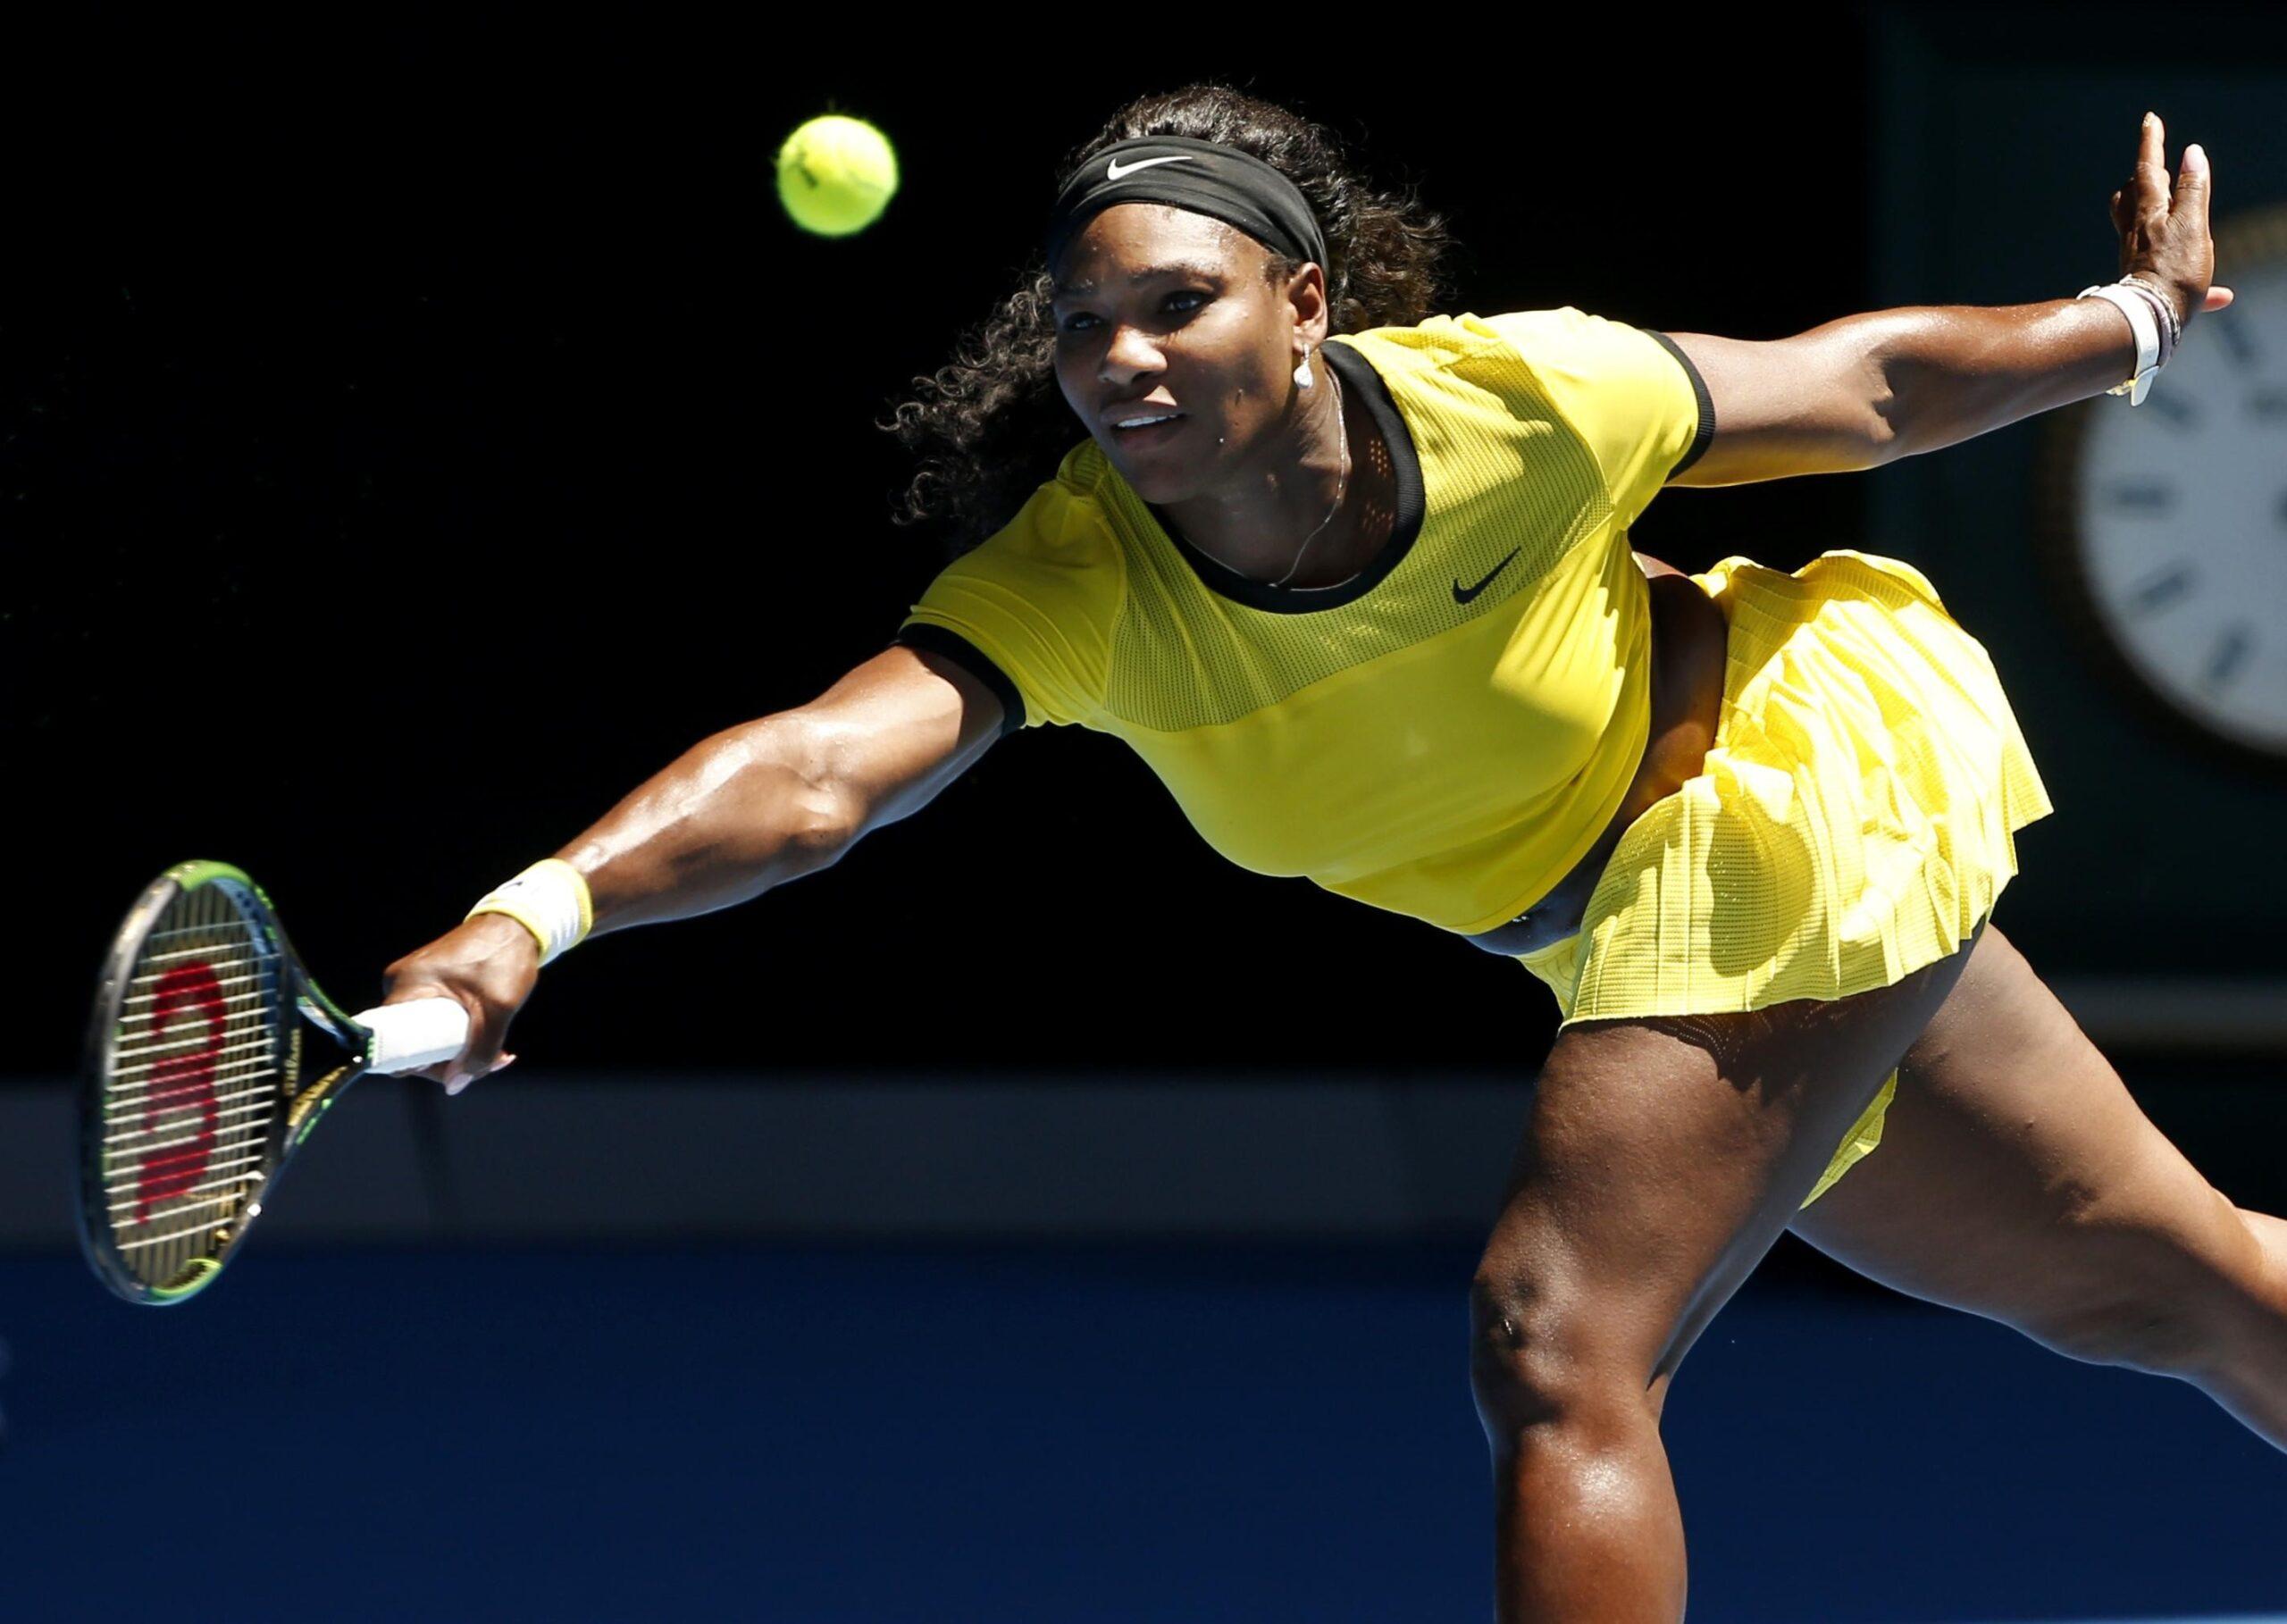 Serena Williams Wallpapers 2